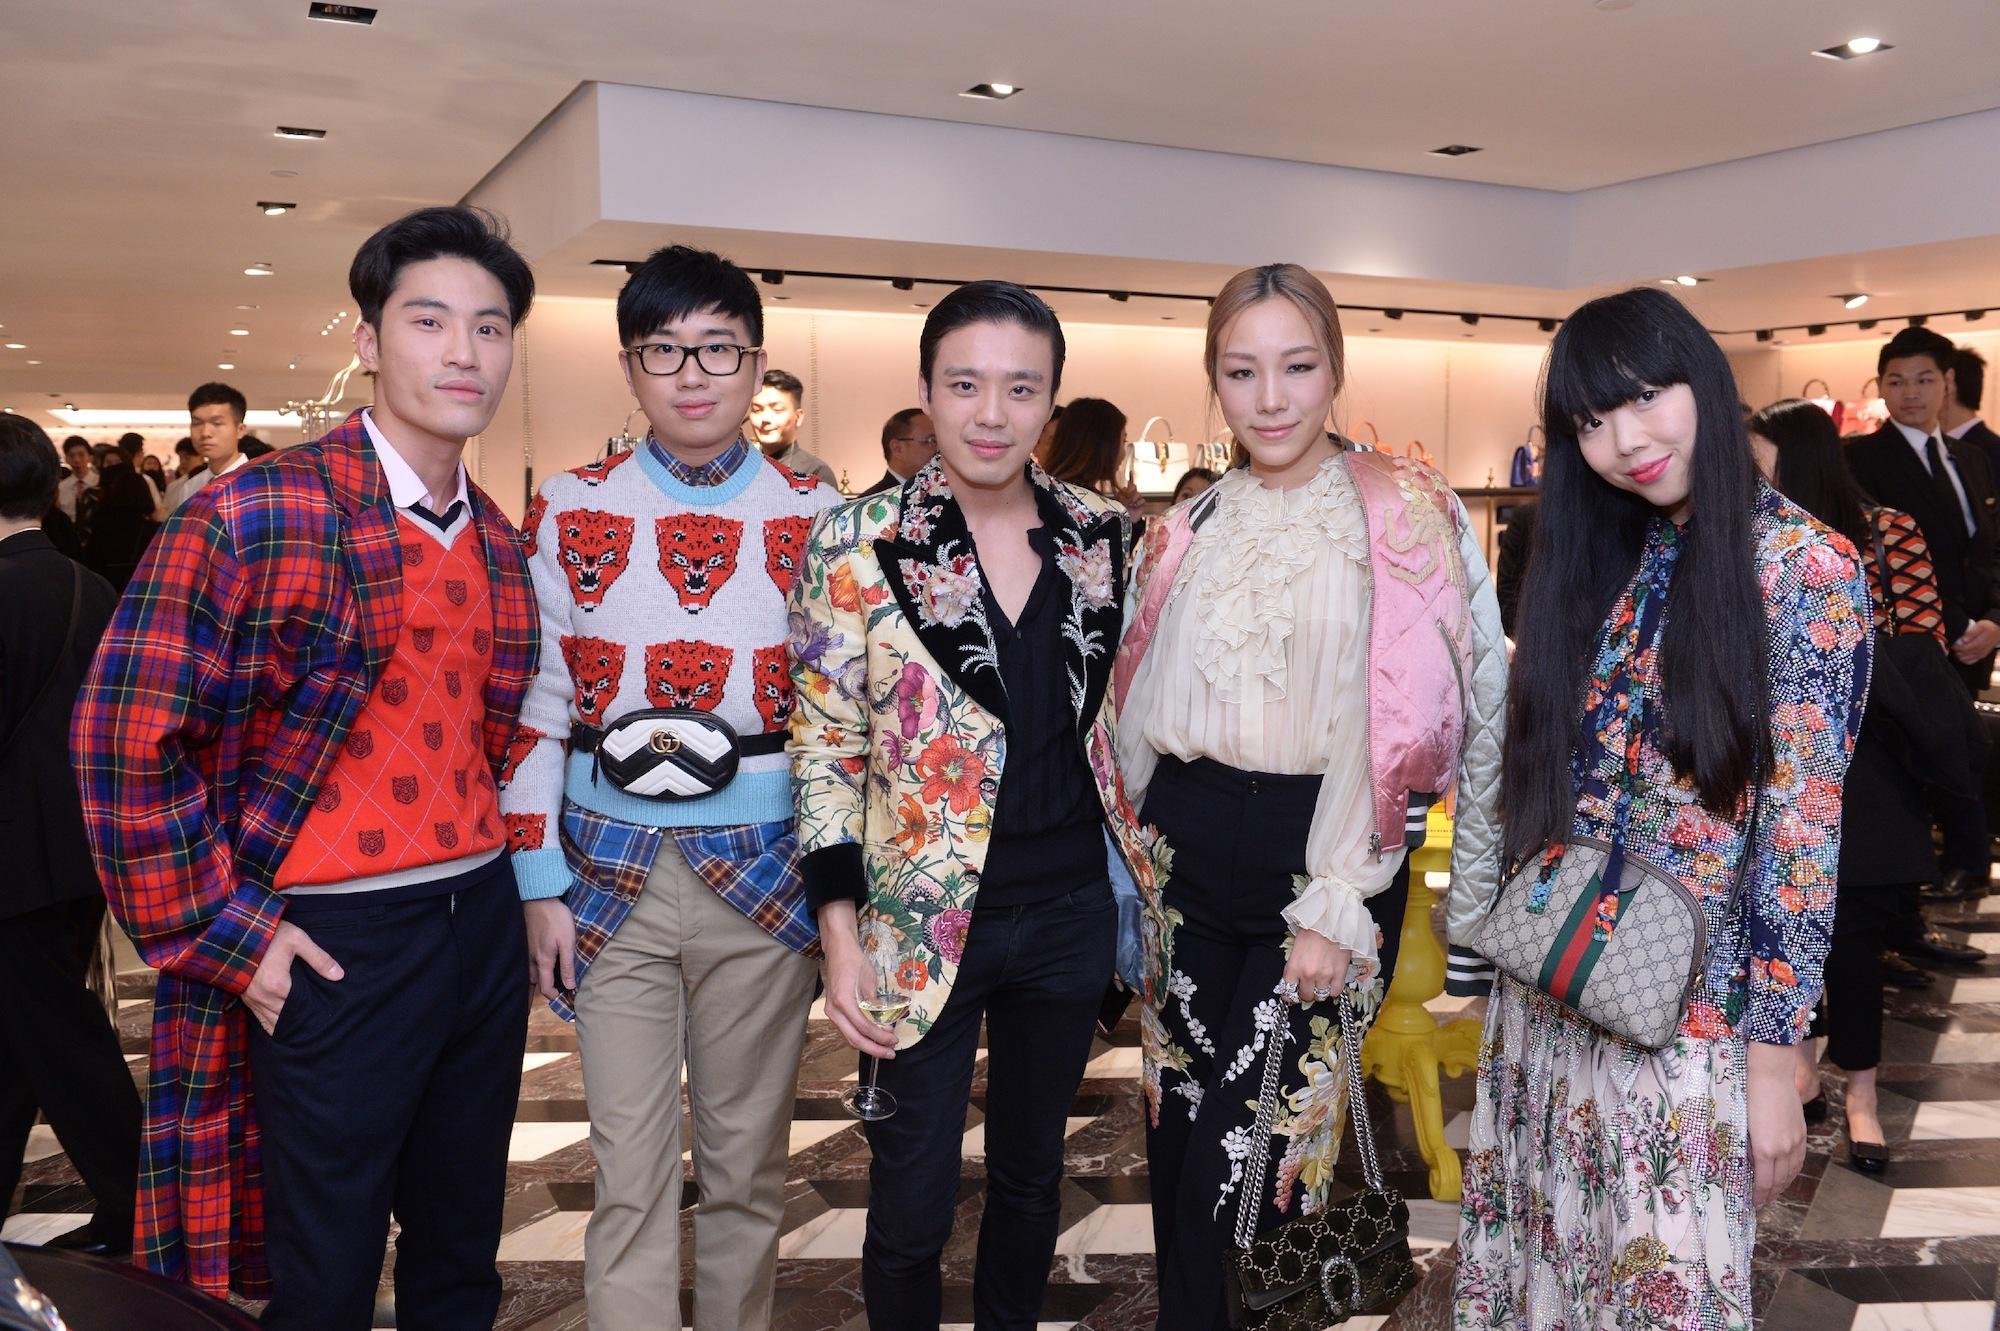 Loui Lim, Declan Chan, Jonathan Cheung, Feiping Chang, Susie Lau